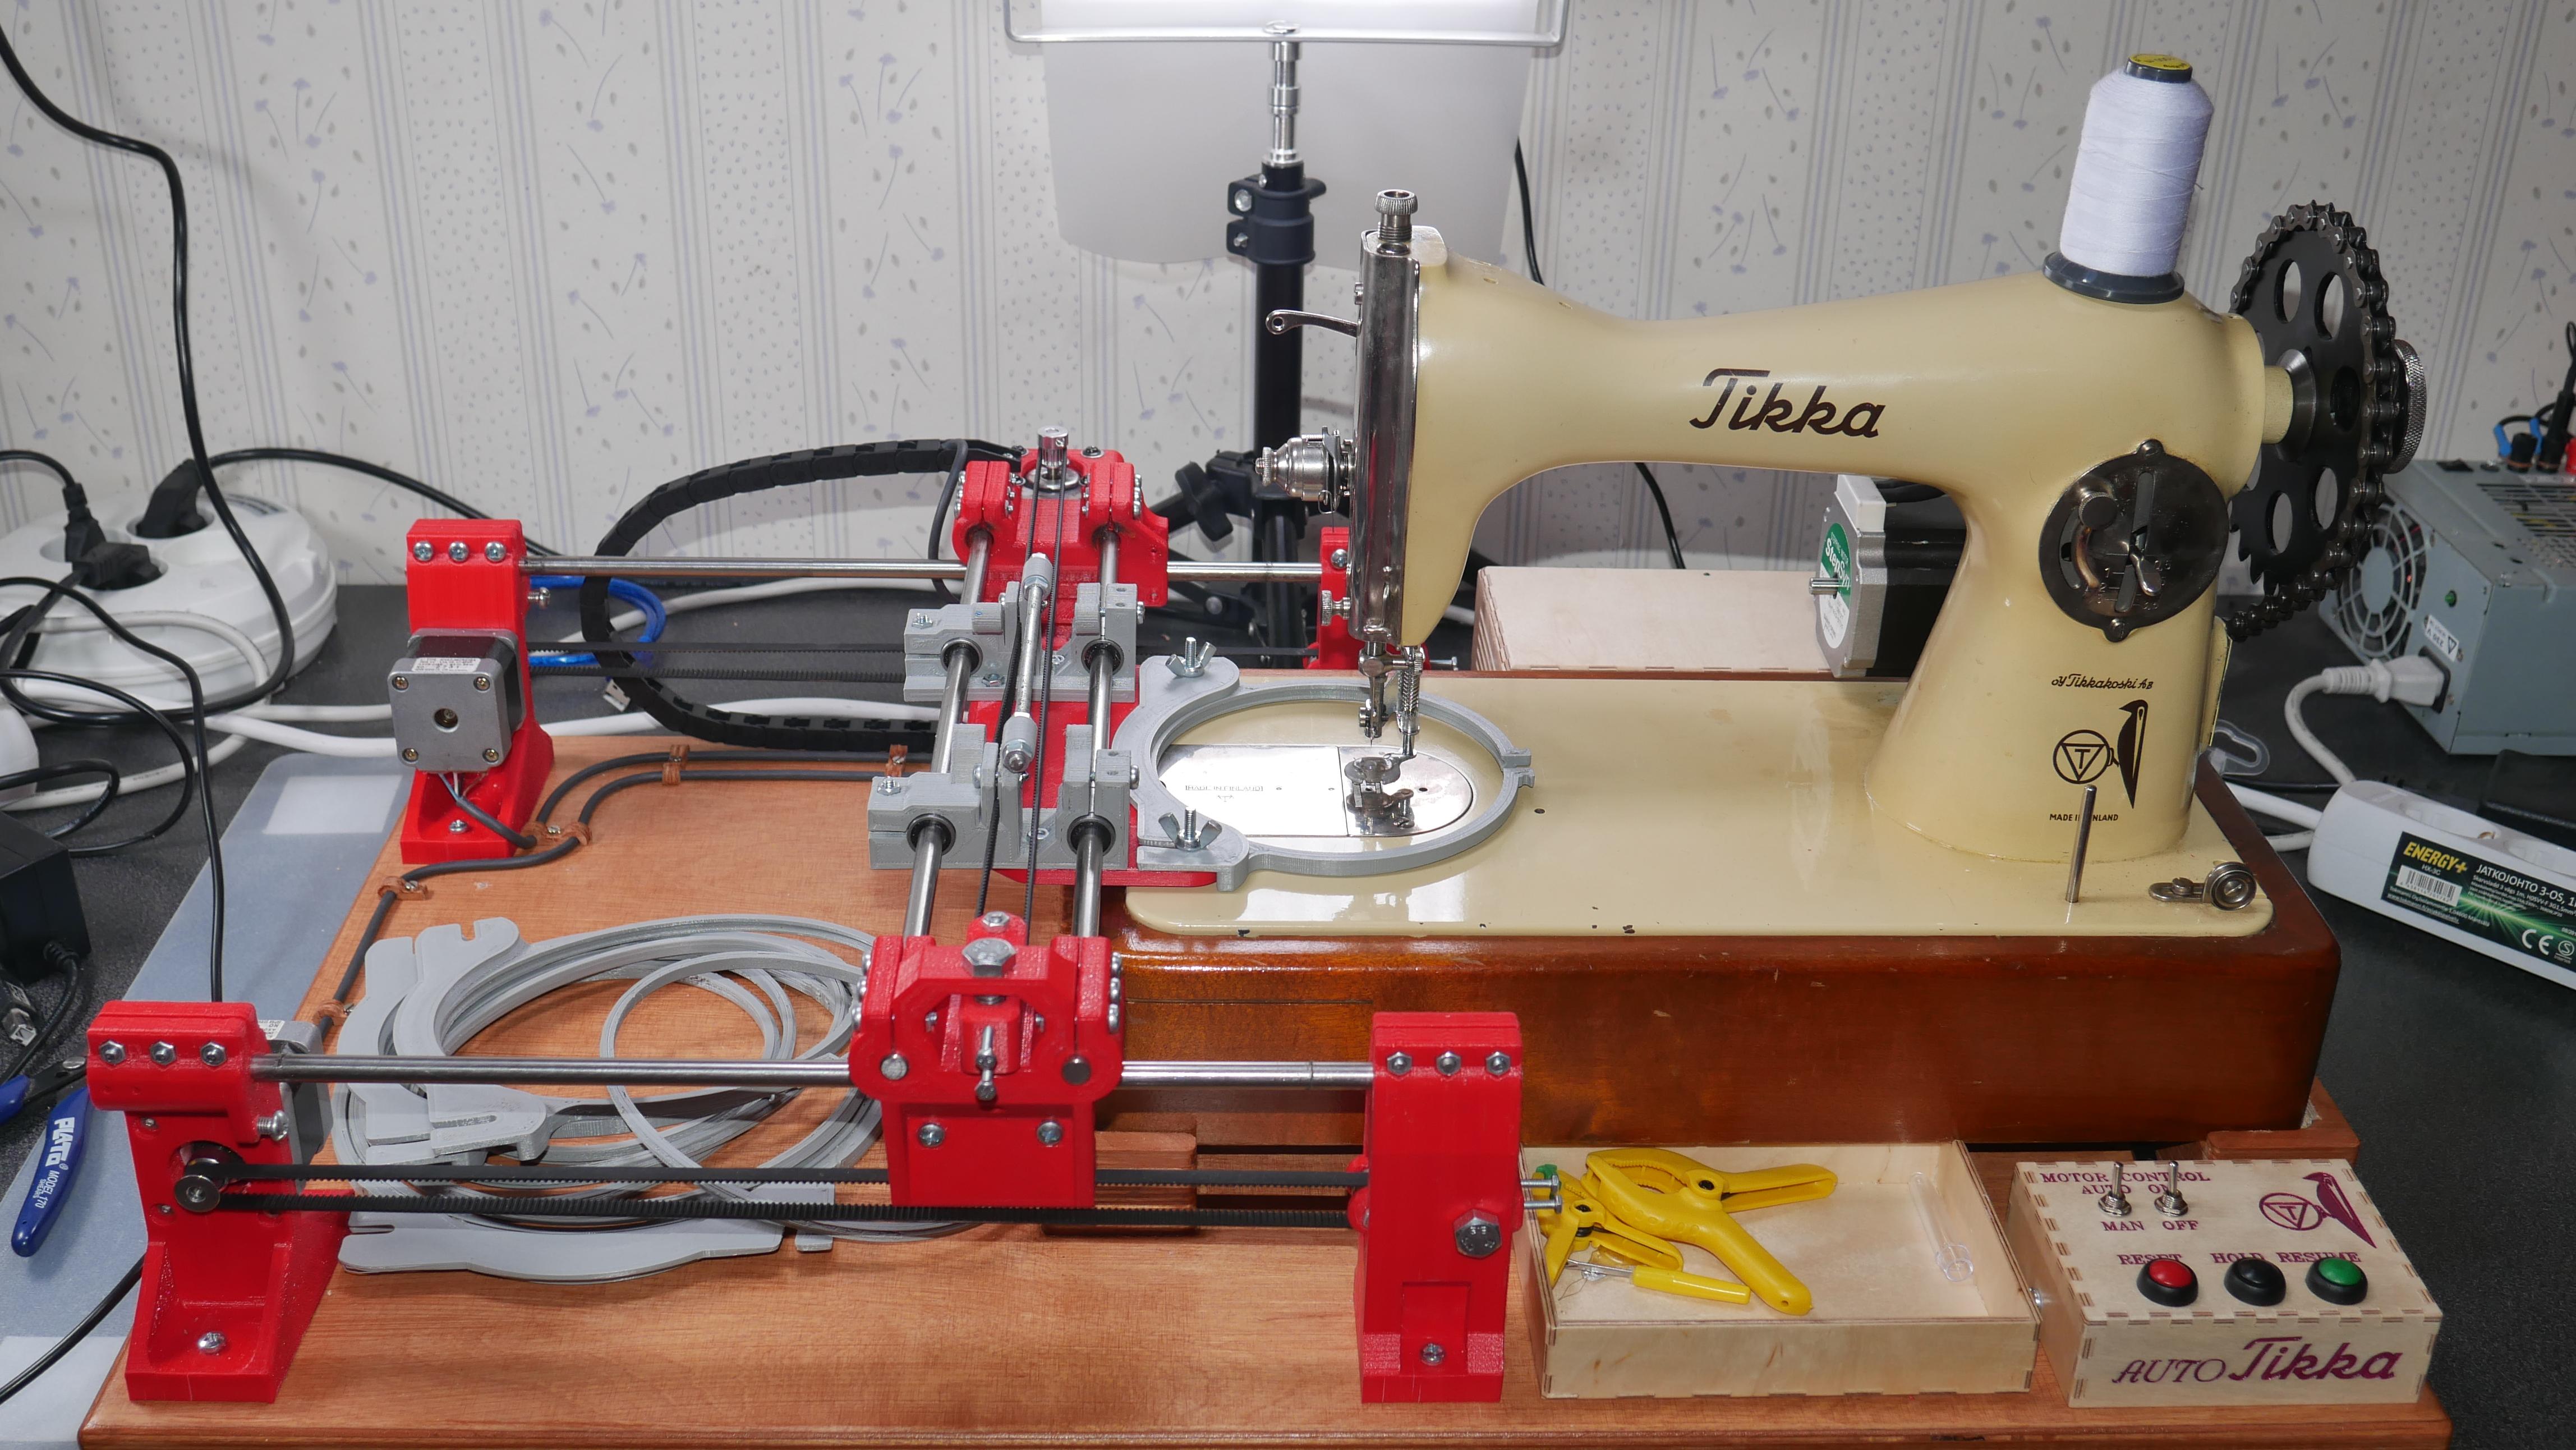 Self Made Embroidery Machine Running On G Code